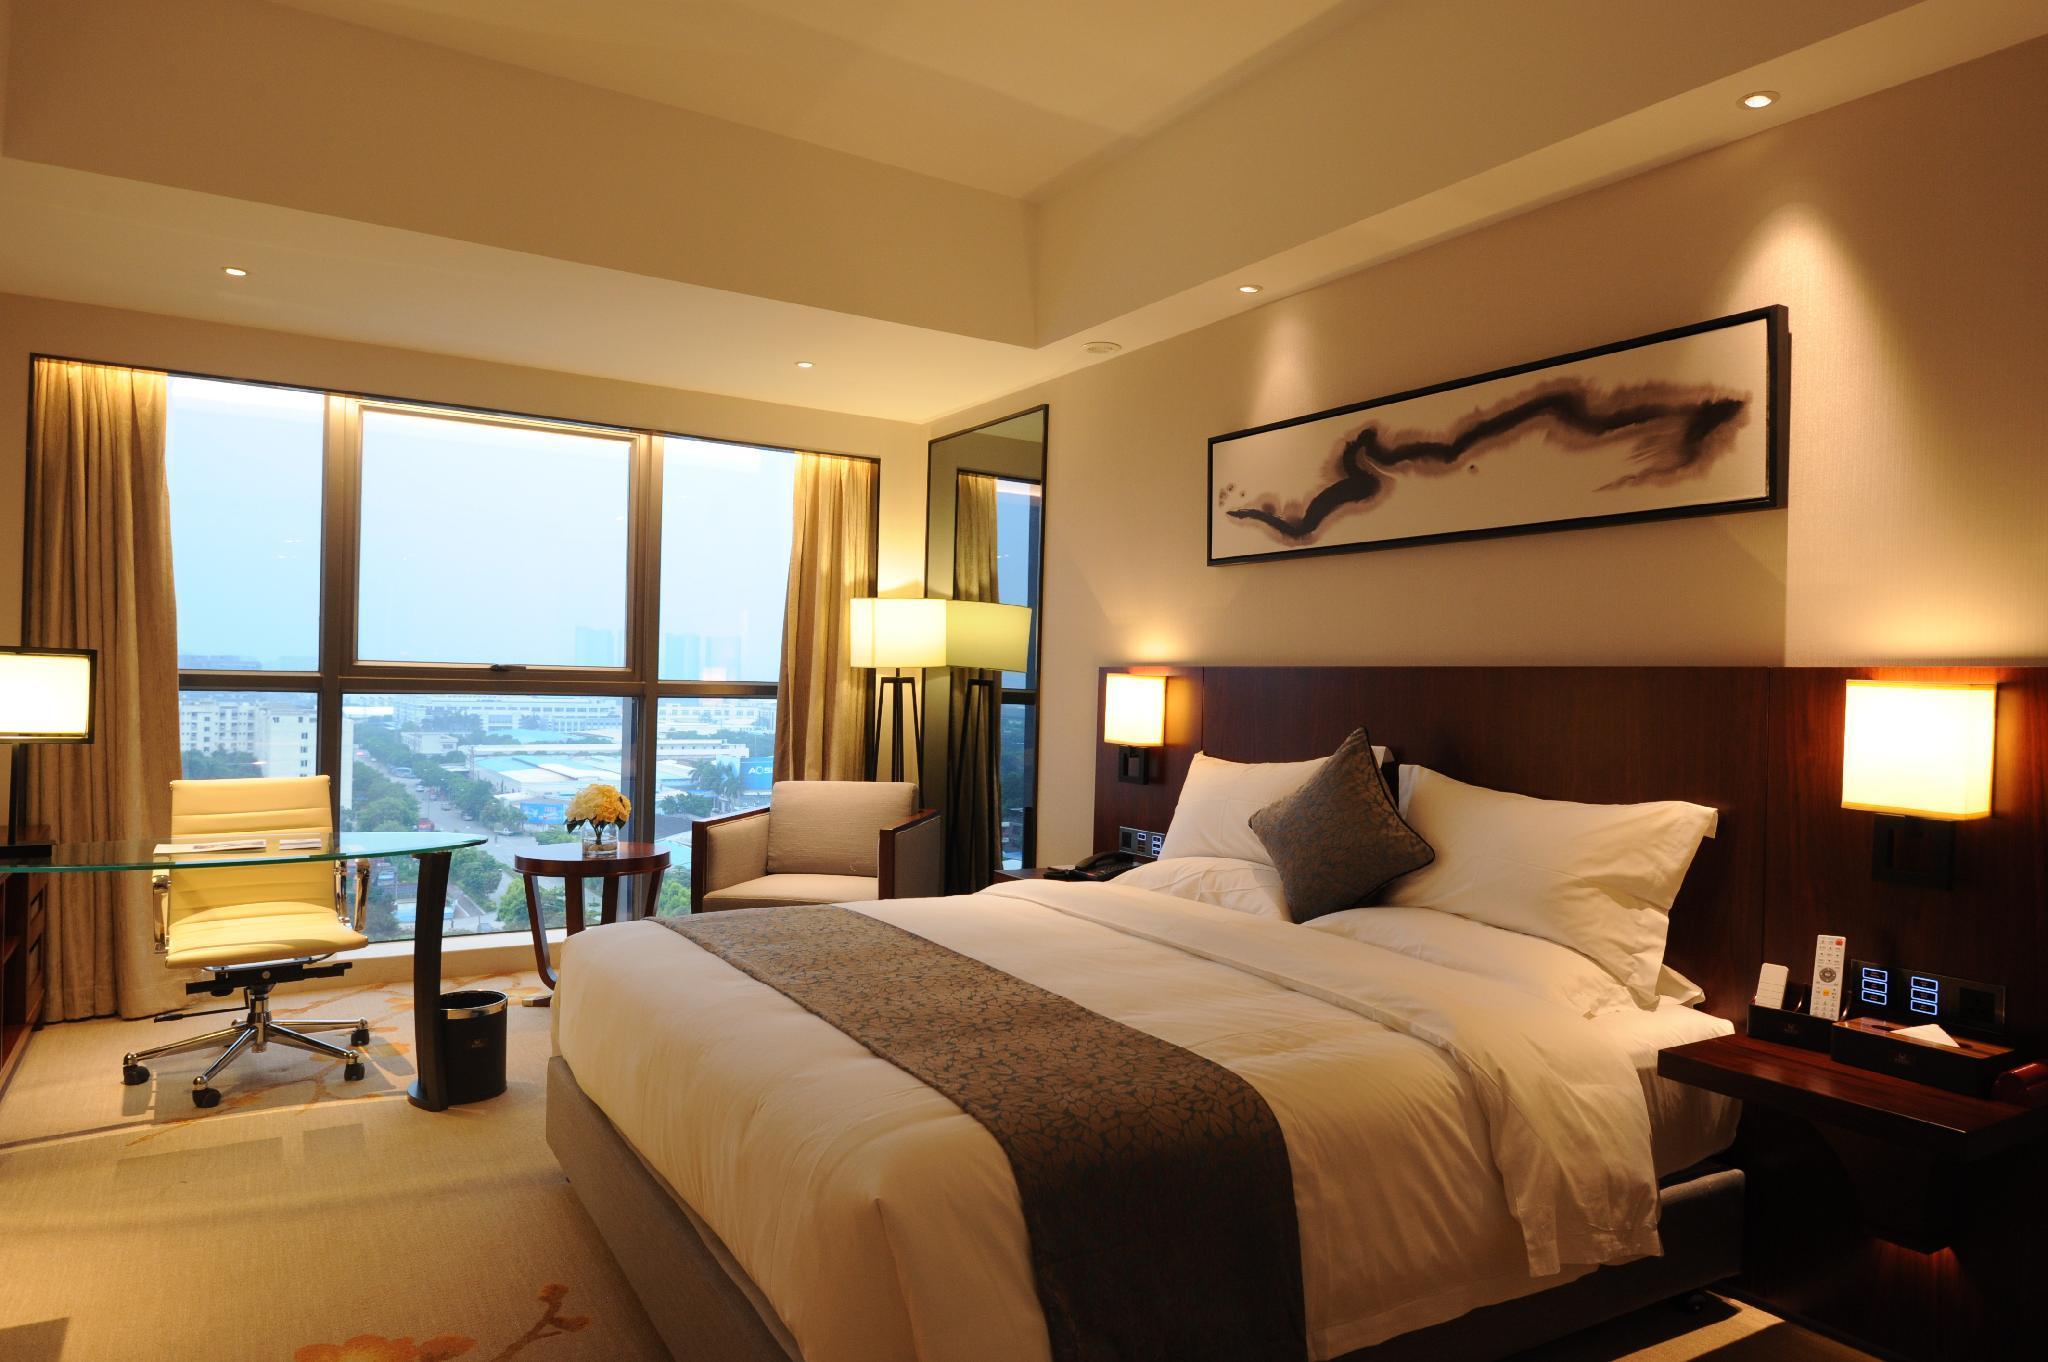 homewisehotel, Foshan